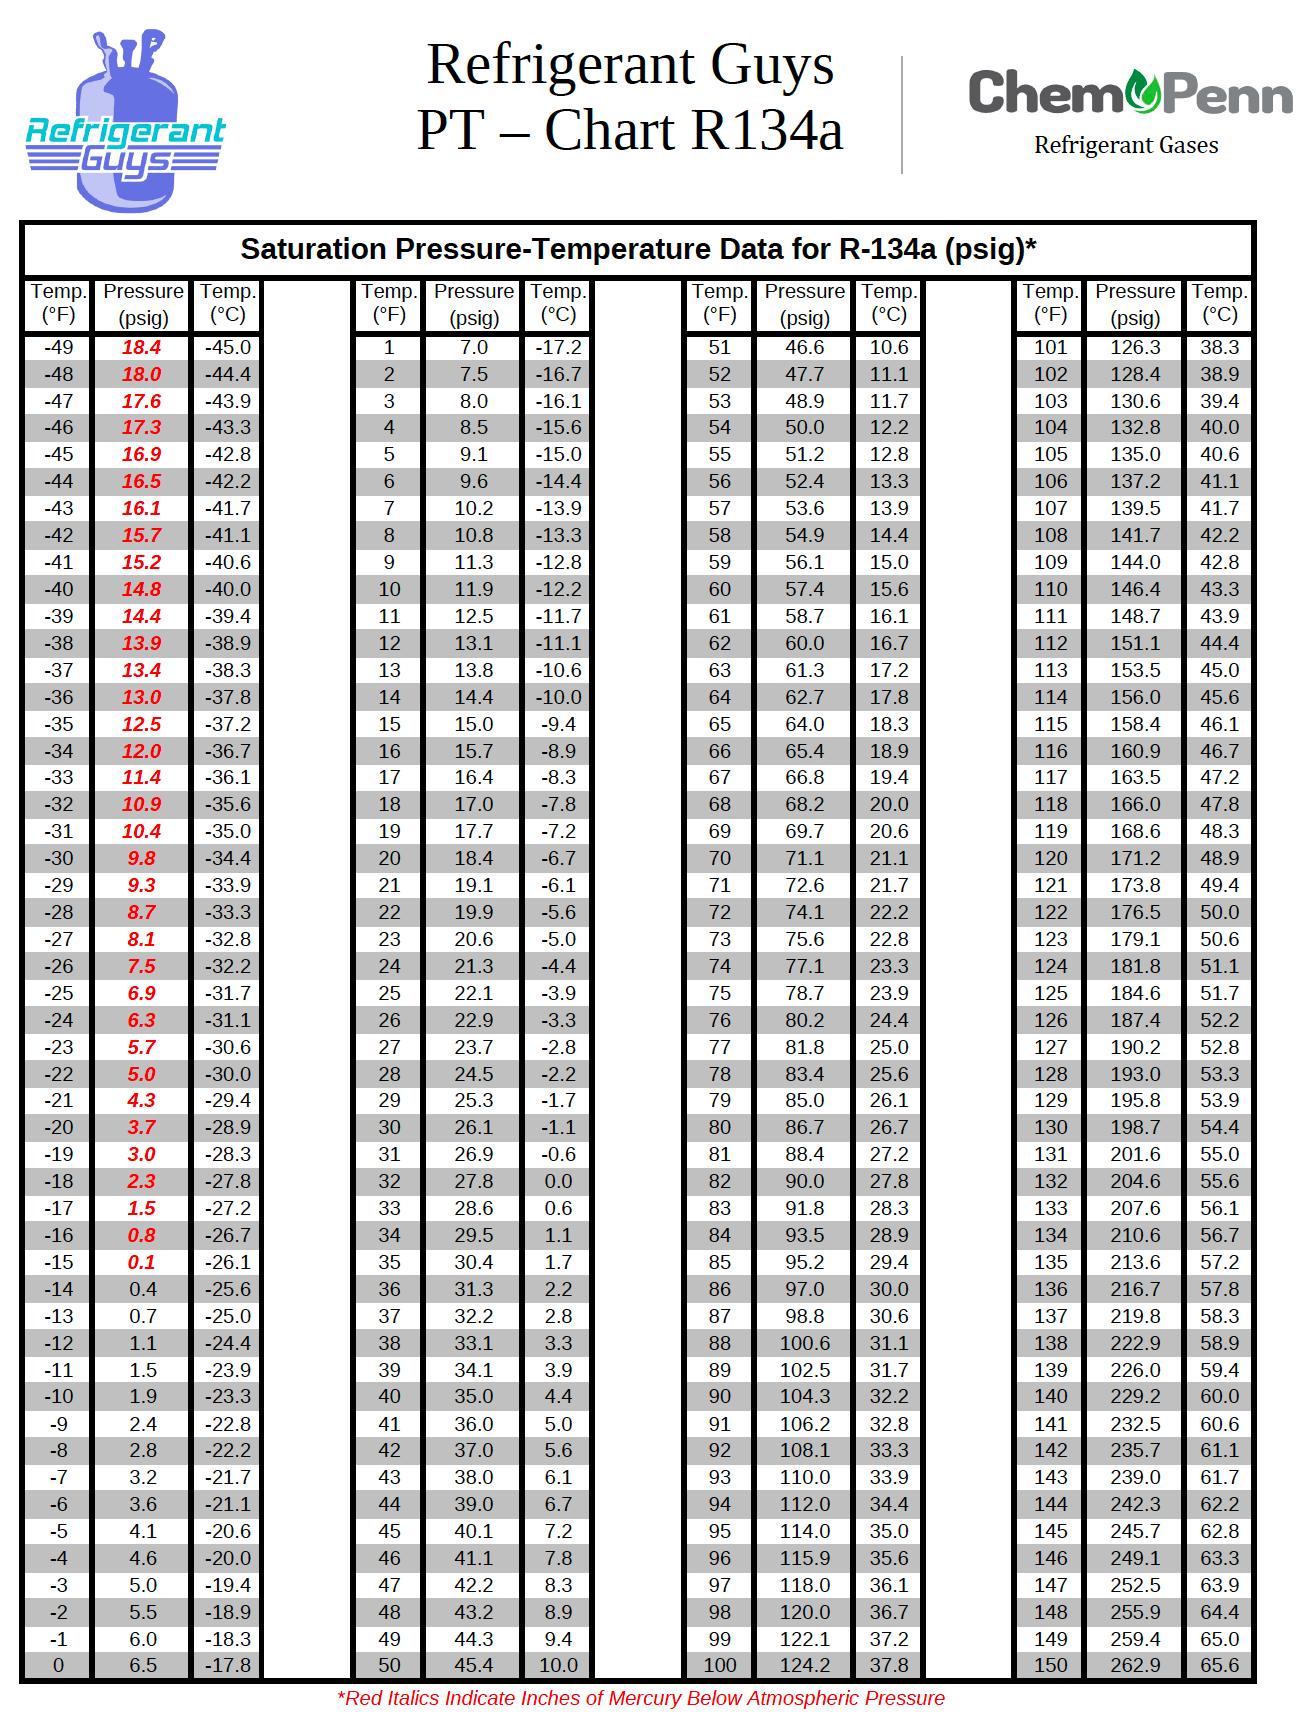 Chart R134a Refrigerant Guys Pt   Temperature chart, Chart ...